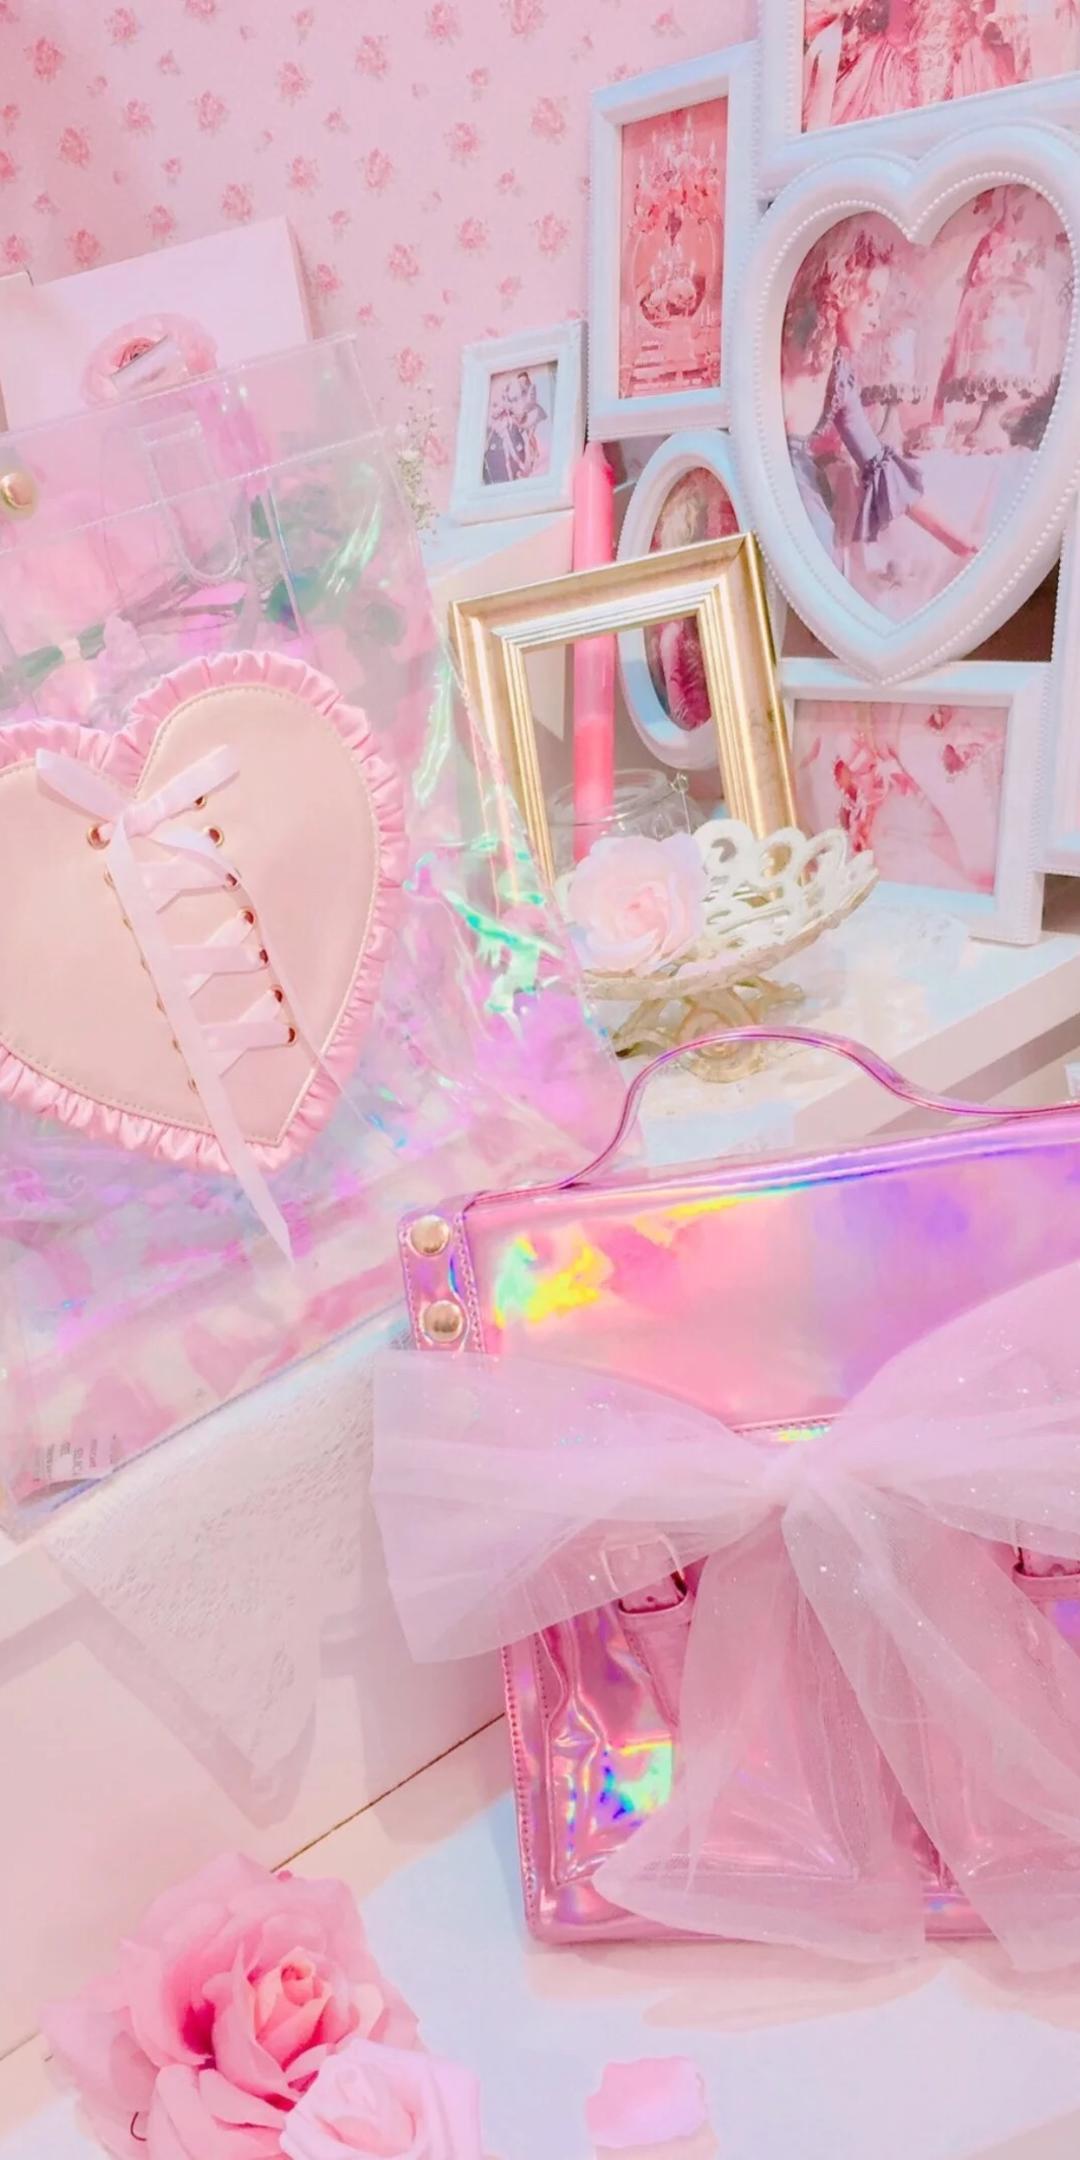 5e67b88c34c28 - 粉色系少女心手机壁纸